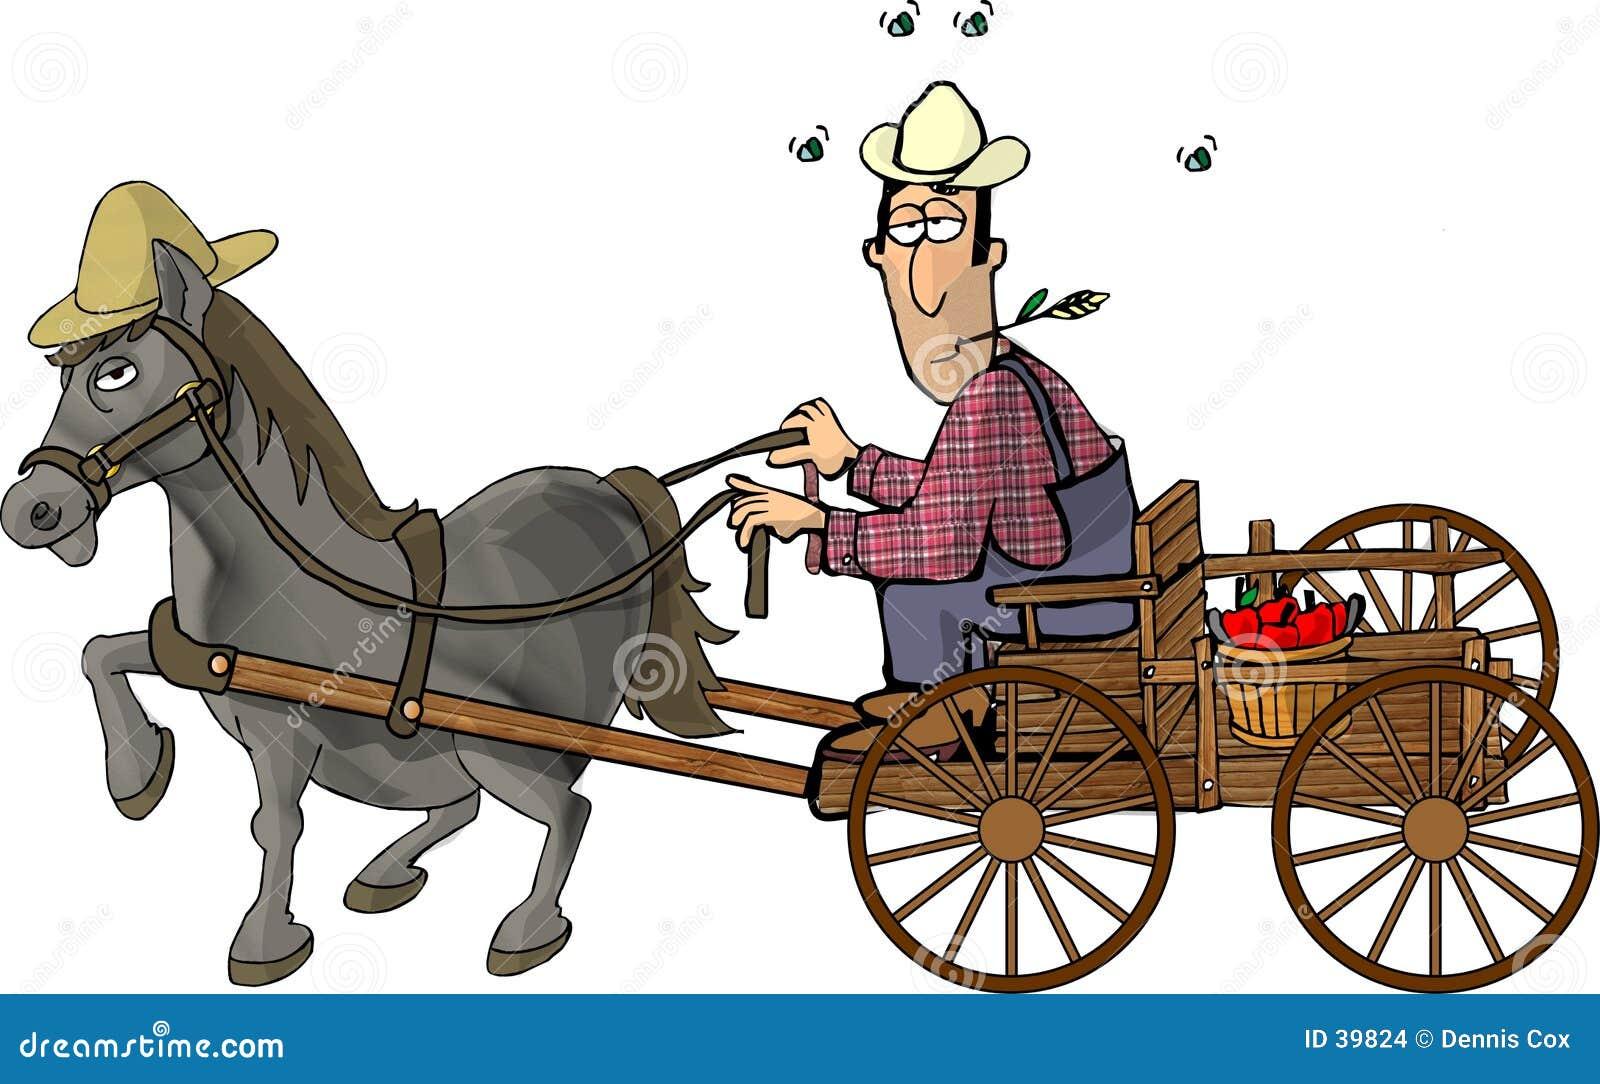 Farmer and his horse drawn wagon